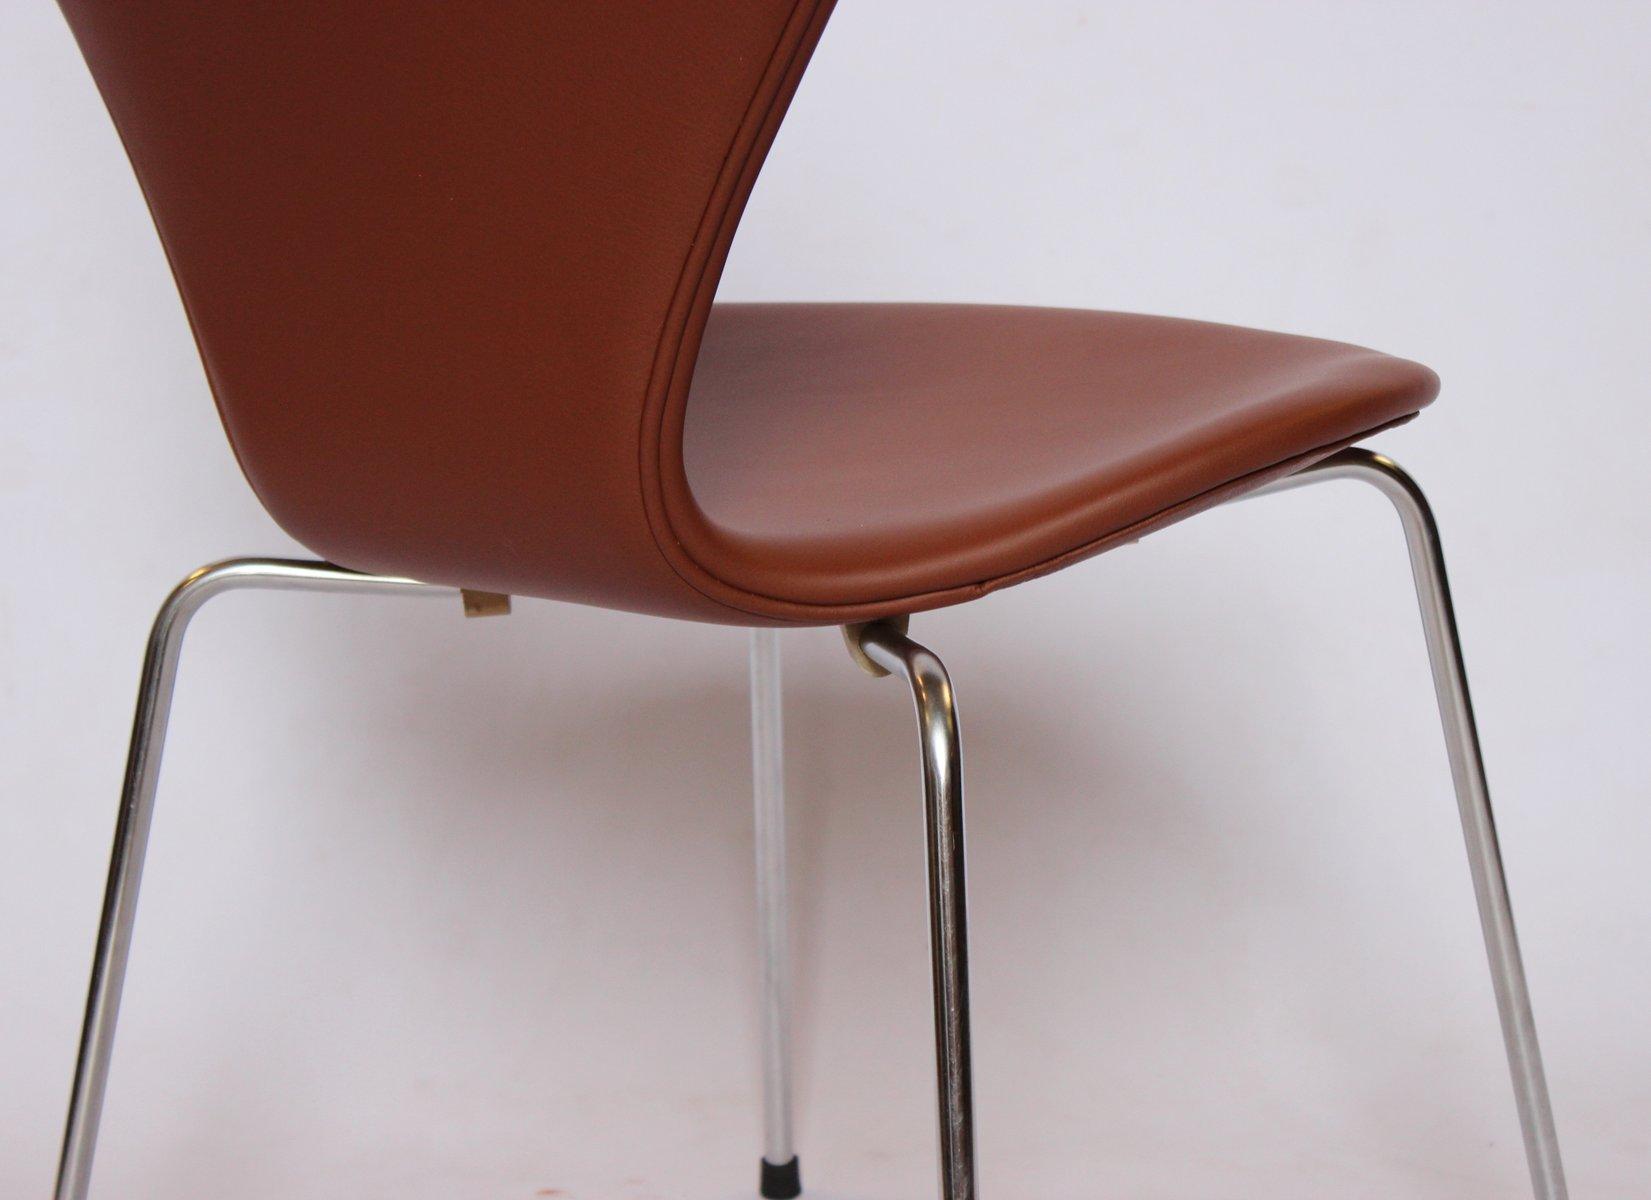 Sedie modello 3107 in pelle di Arne Jacobsen per Fritz ...